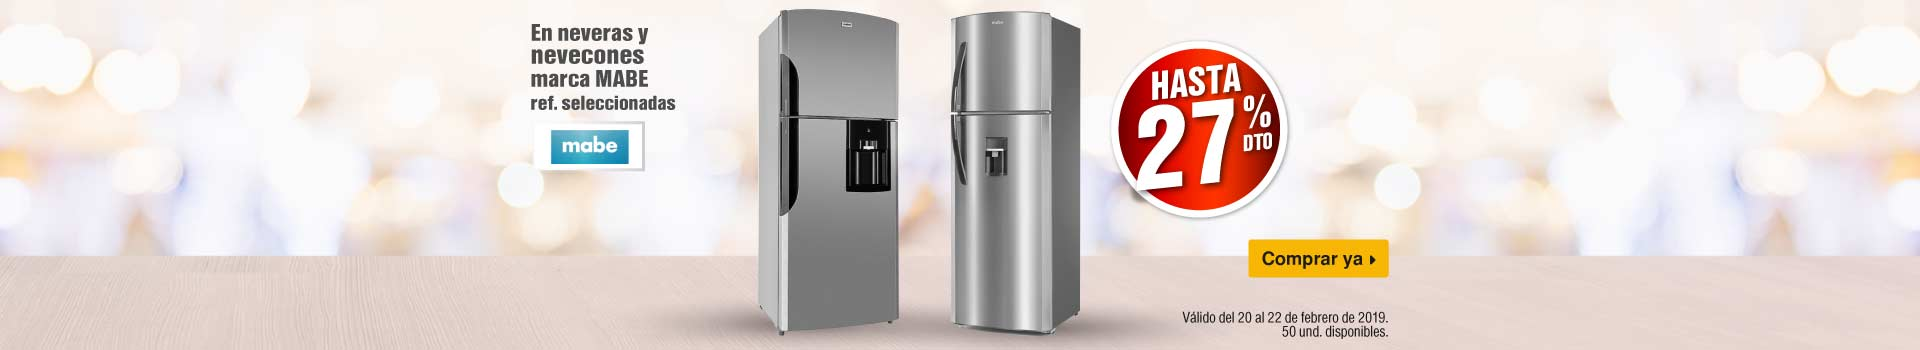 AK-KT-mayores-2-ELECT-BCAT-refrigeracion-200219